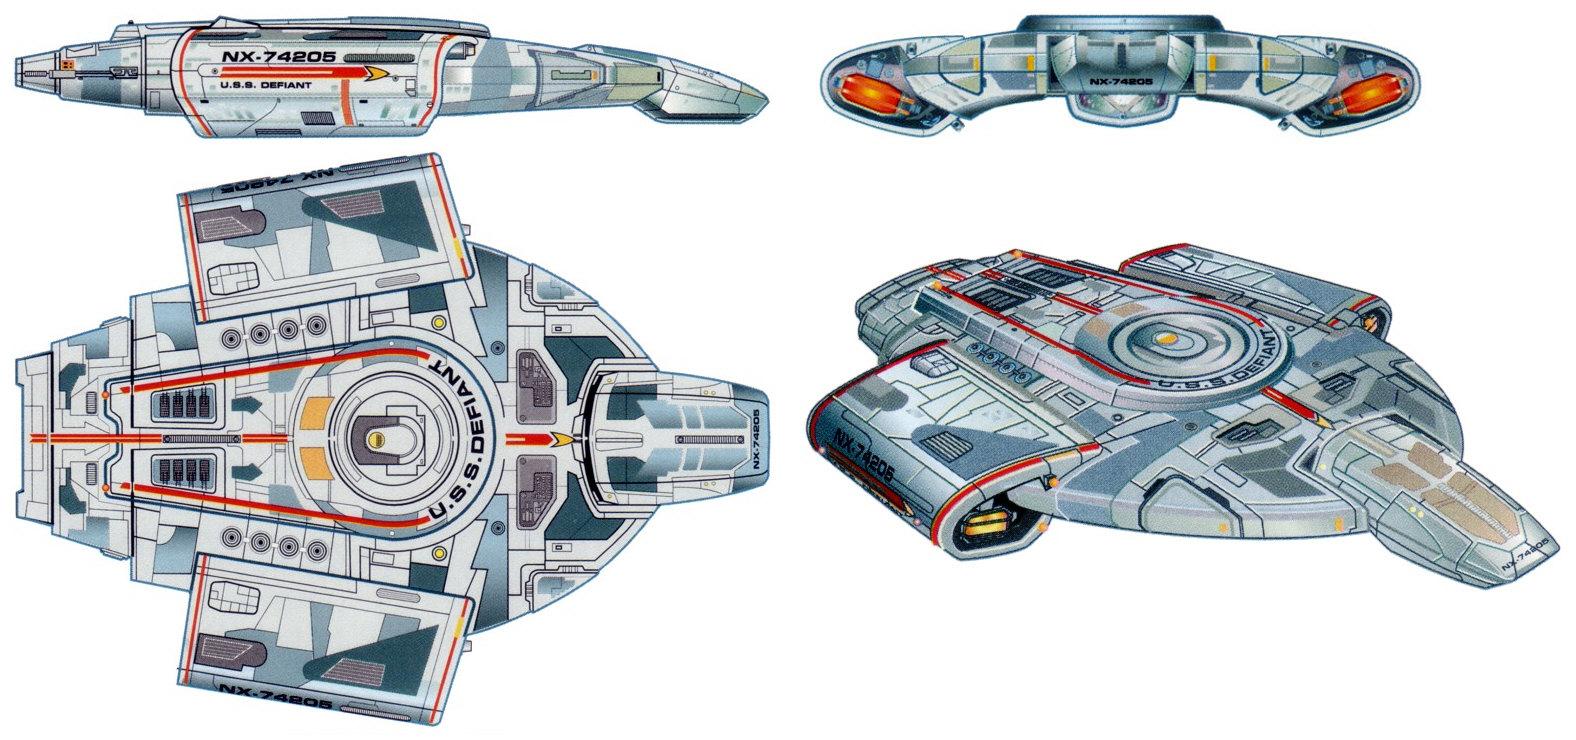 Ex Astris Scientia - Defiant Problems on runabout schematics, uss reliant schematics, deep space nine schematics, uss titan schematics, uss diligent, millennium falcon schematics, uss equinox, uss voyager, star trek ship schematics, uss excalibur, uss reliant deck plans, uss yamaguchi, uss lst schematic, uss vengeance star trek, uss valiant schematics, uss prometheus, uss enterprise, space station schematics, uss excelsior, delta flyer schematics,